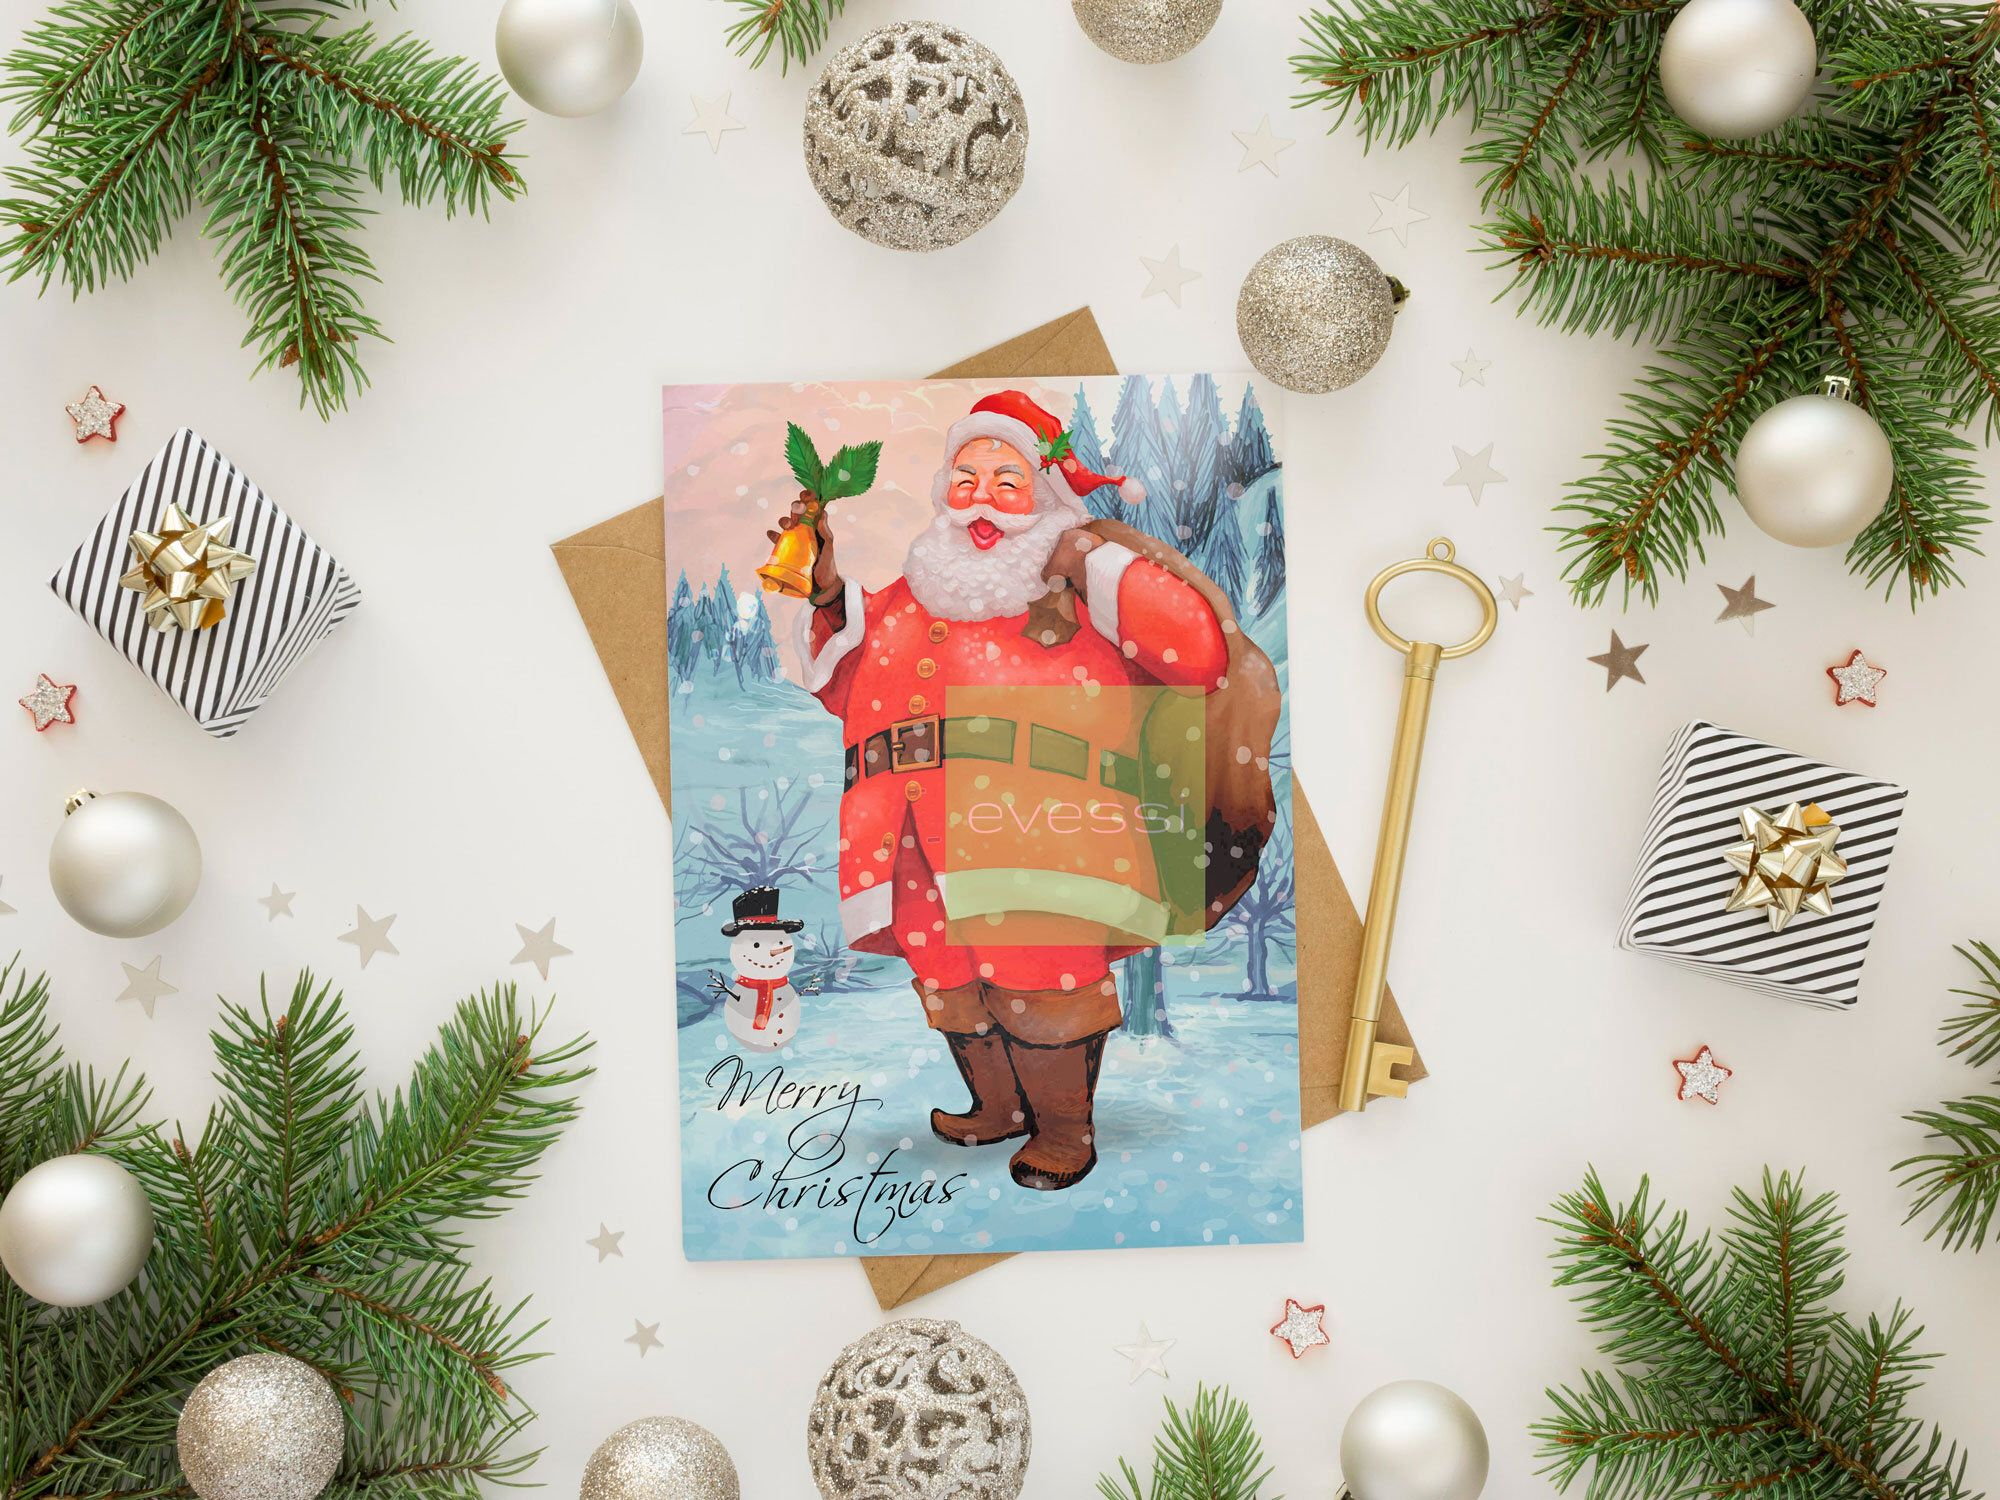 Christmas Card Digital Download Christmas Card Printable Santa Claus Card Merry Christmas Card Printable Chri Digital Christmas Cards Christmas Cards Cards